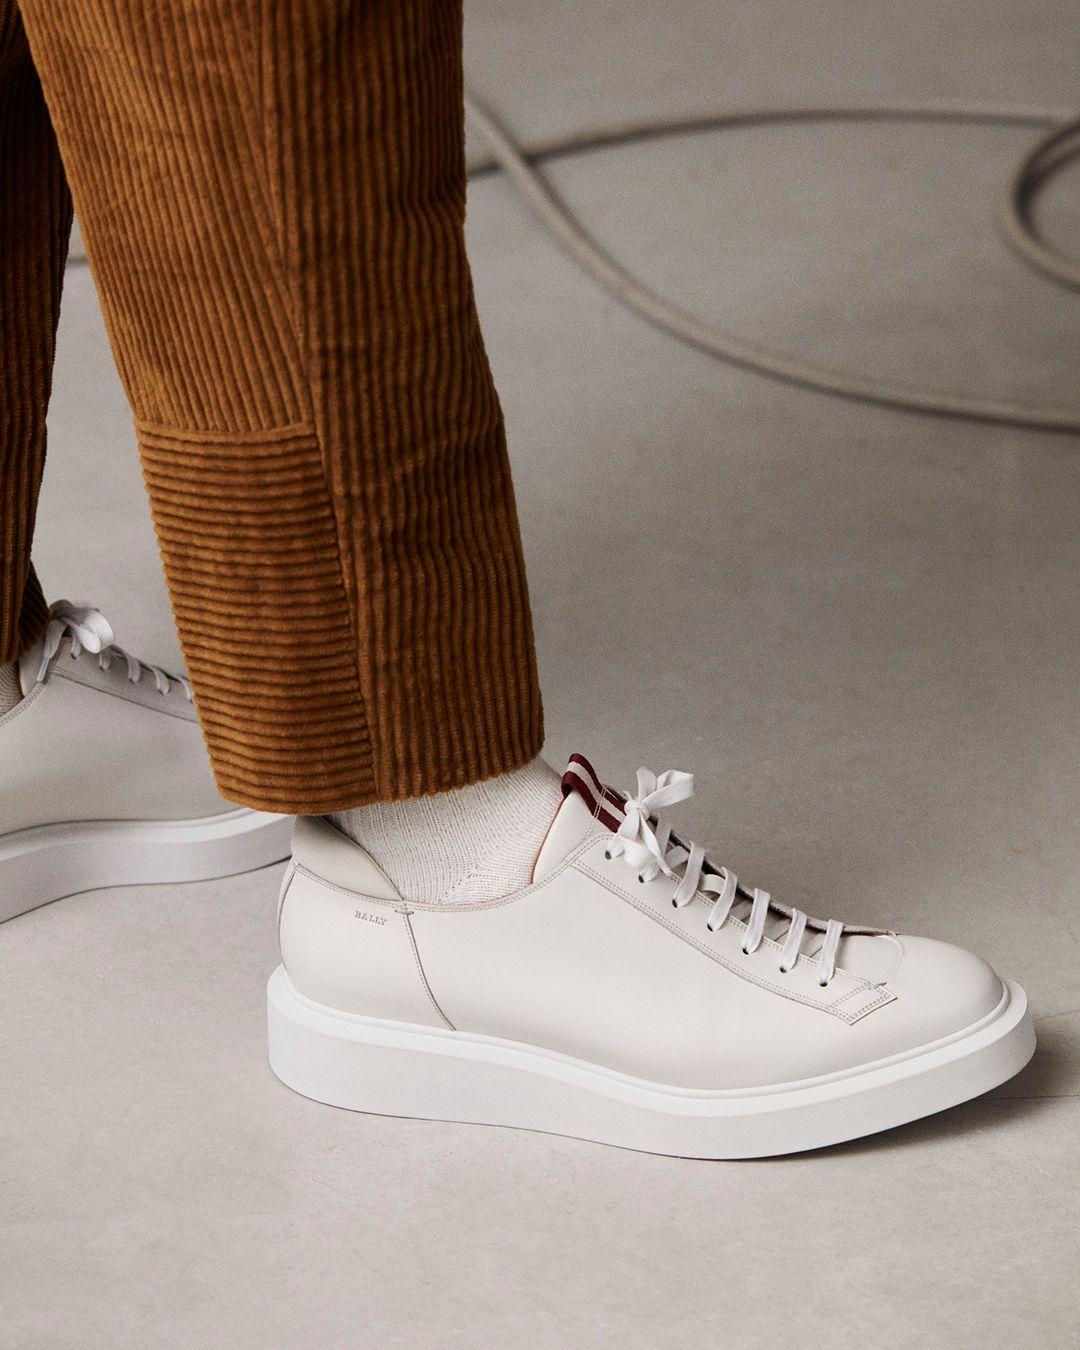 663a6e29b6 Bally Olivio | Fashion- shoes and accessories | Fashion, Mens ...